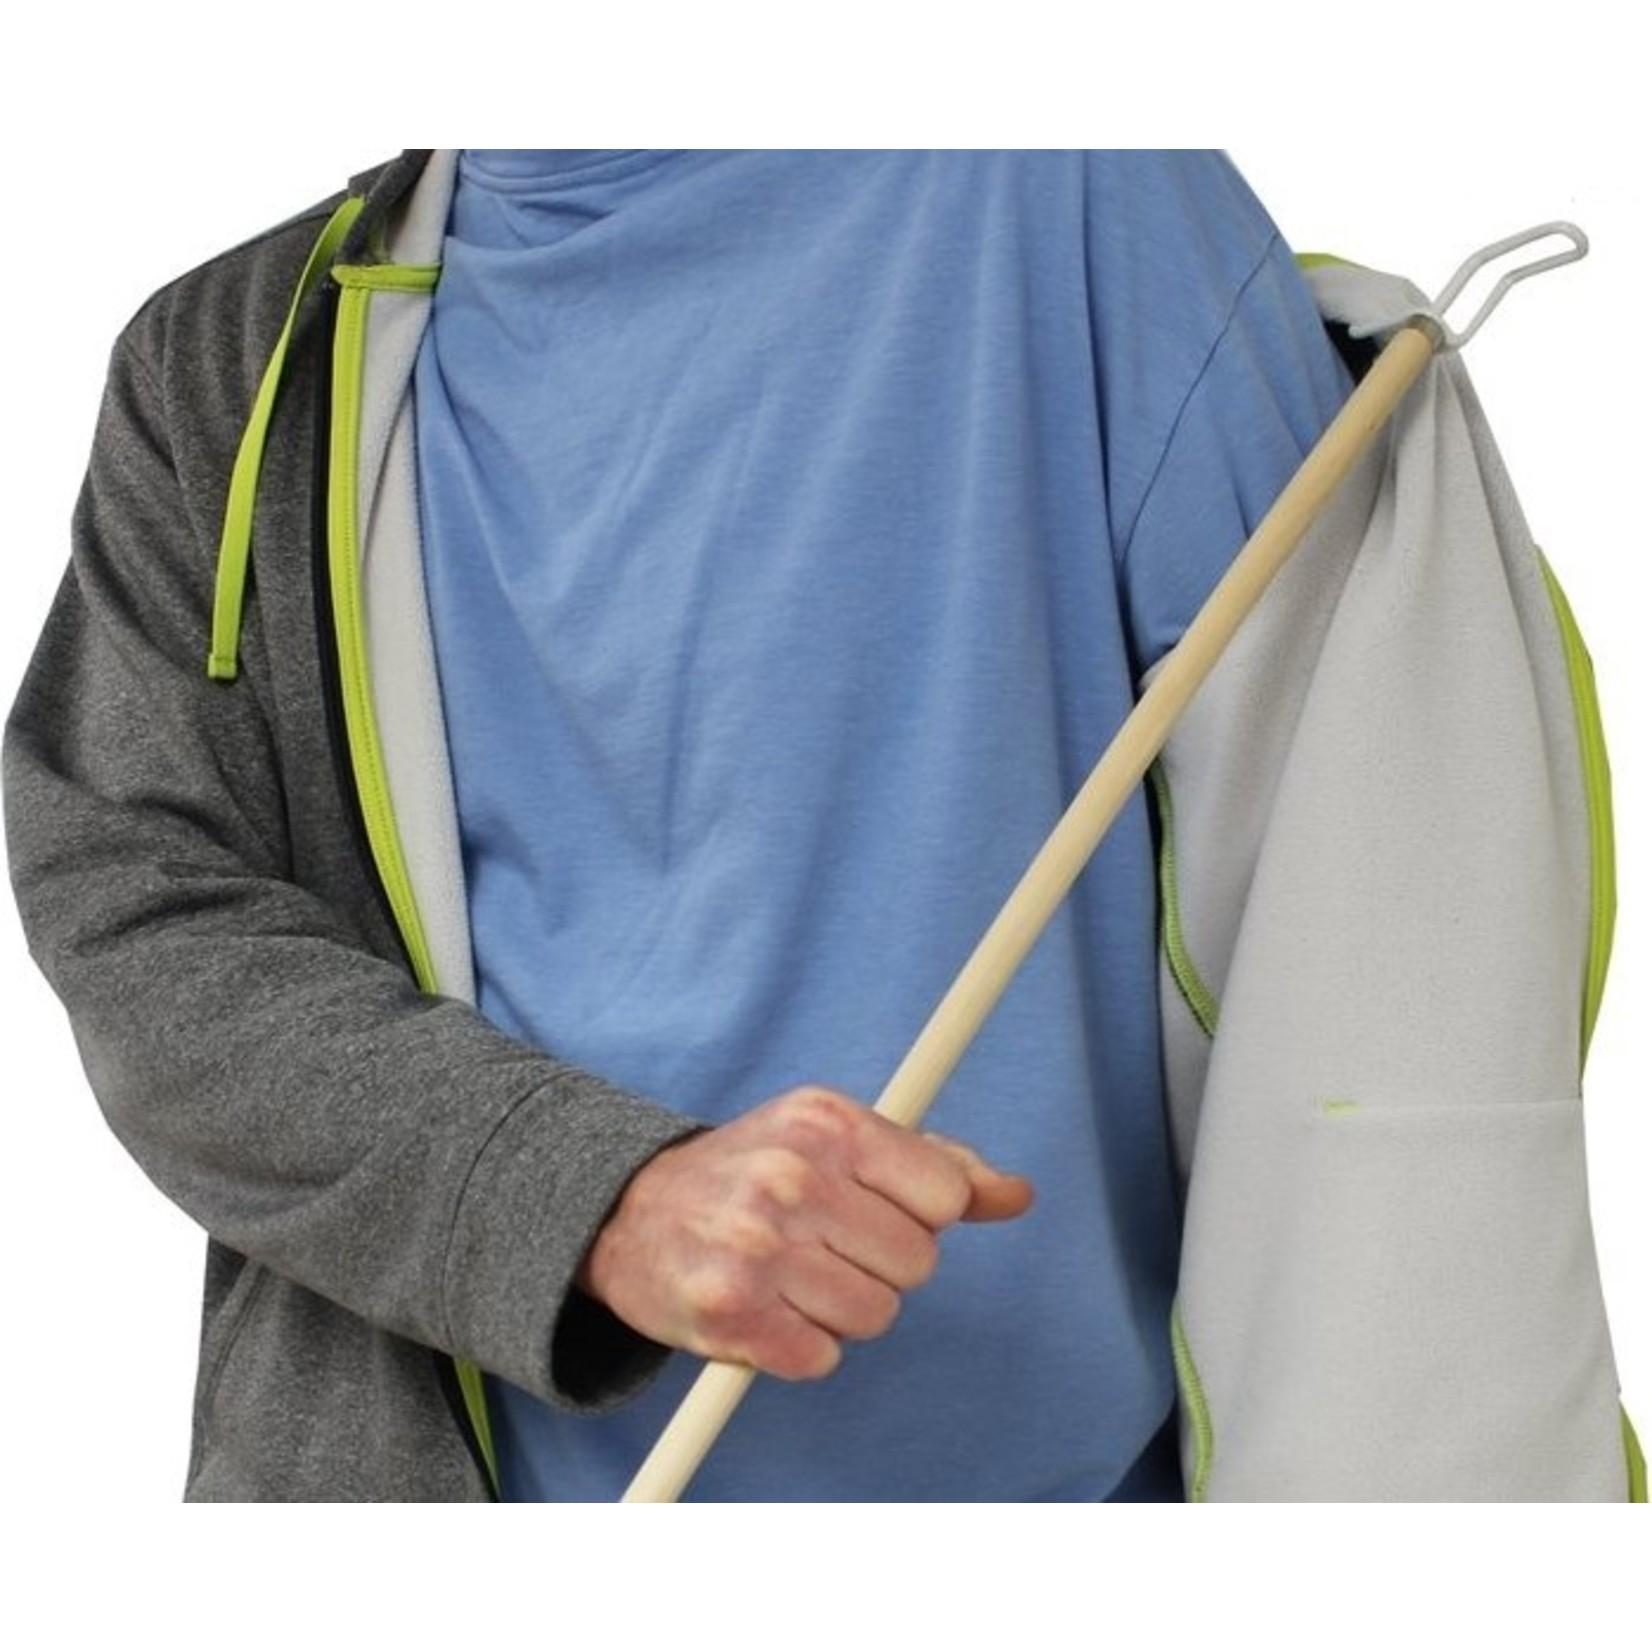 Practika Dressing Aid Stick